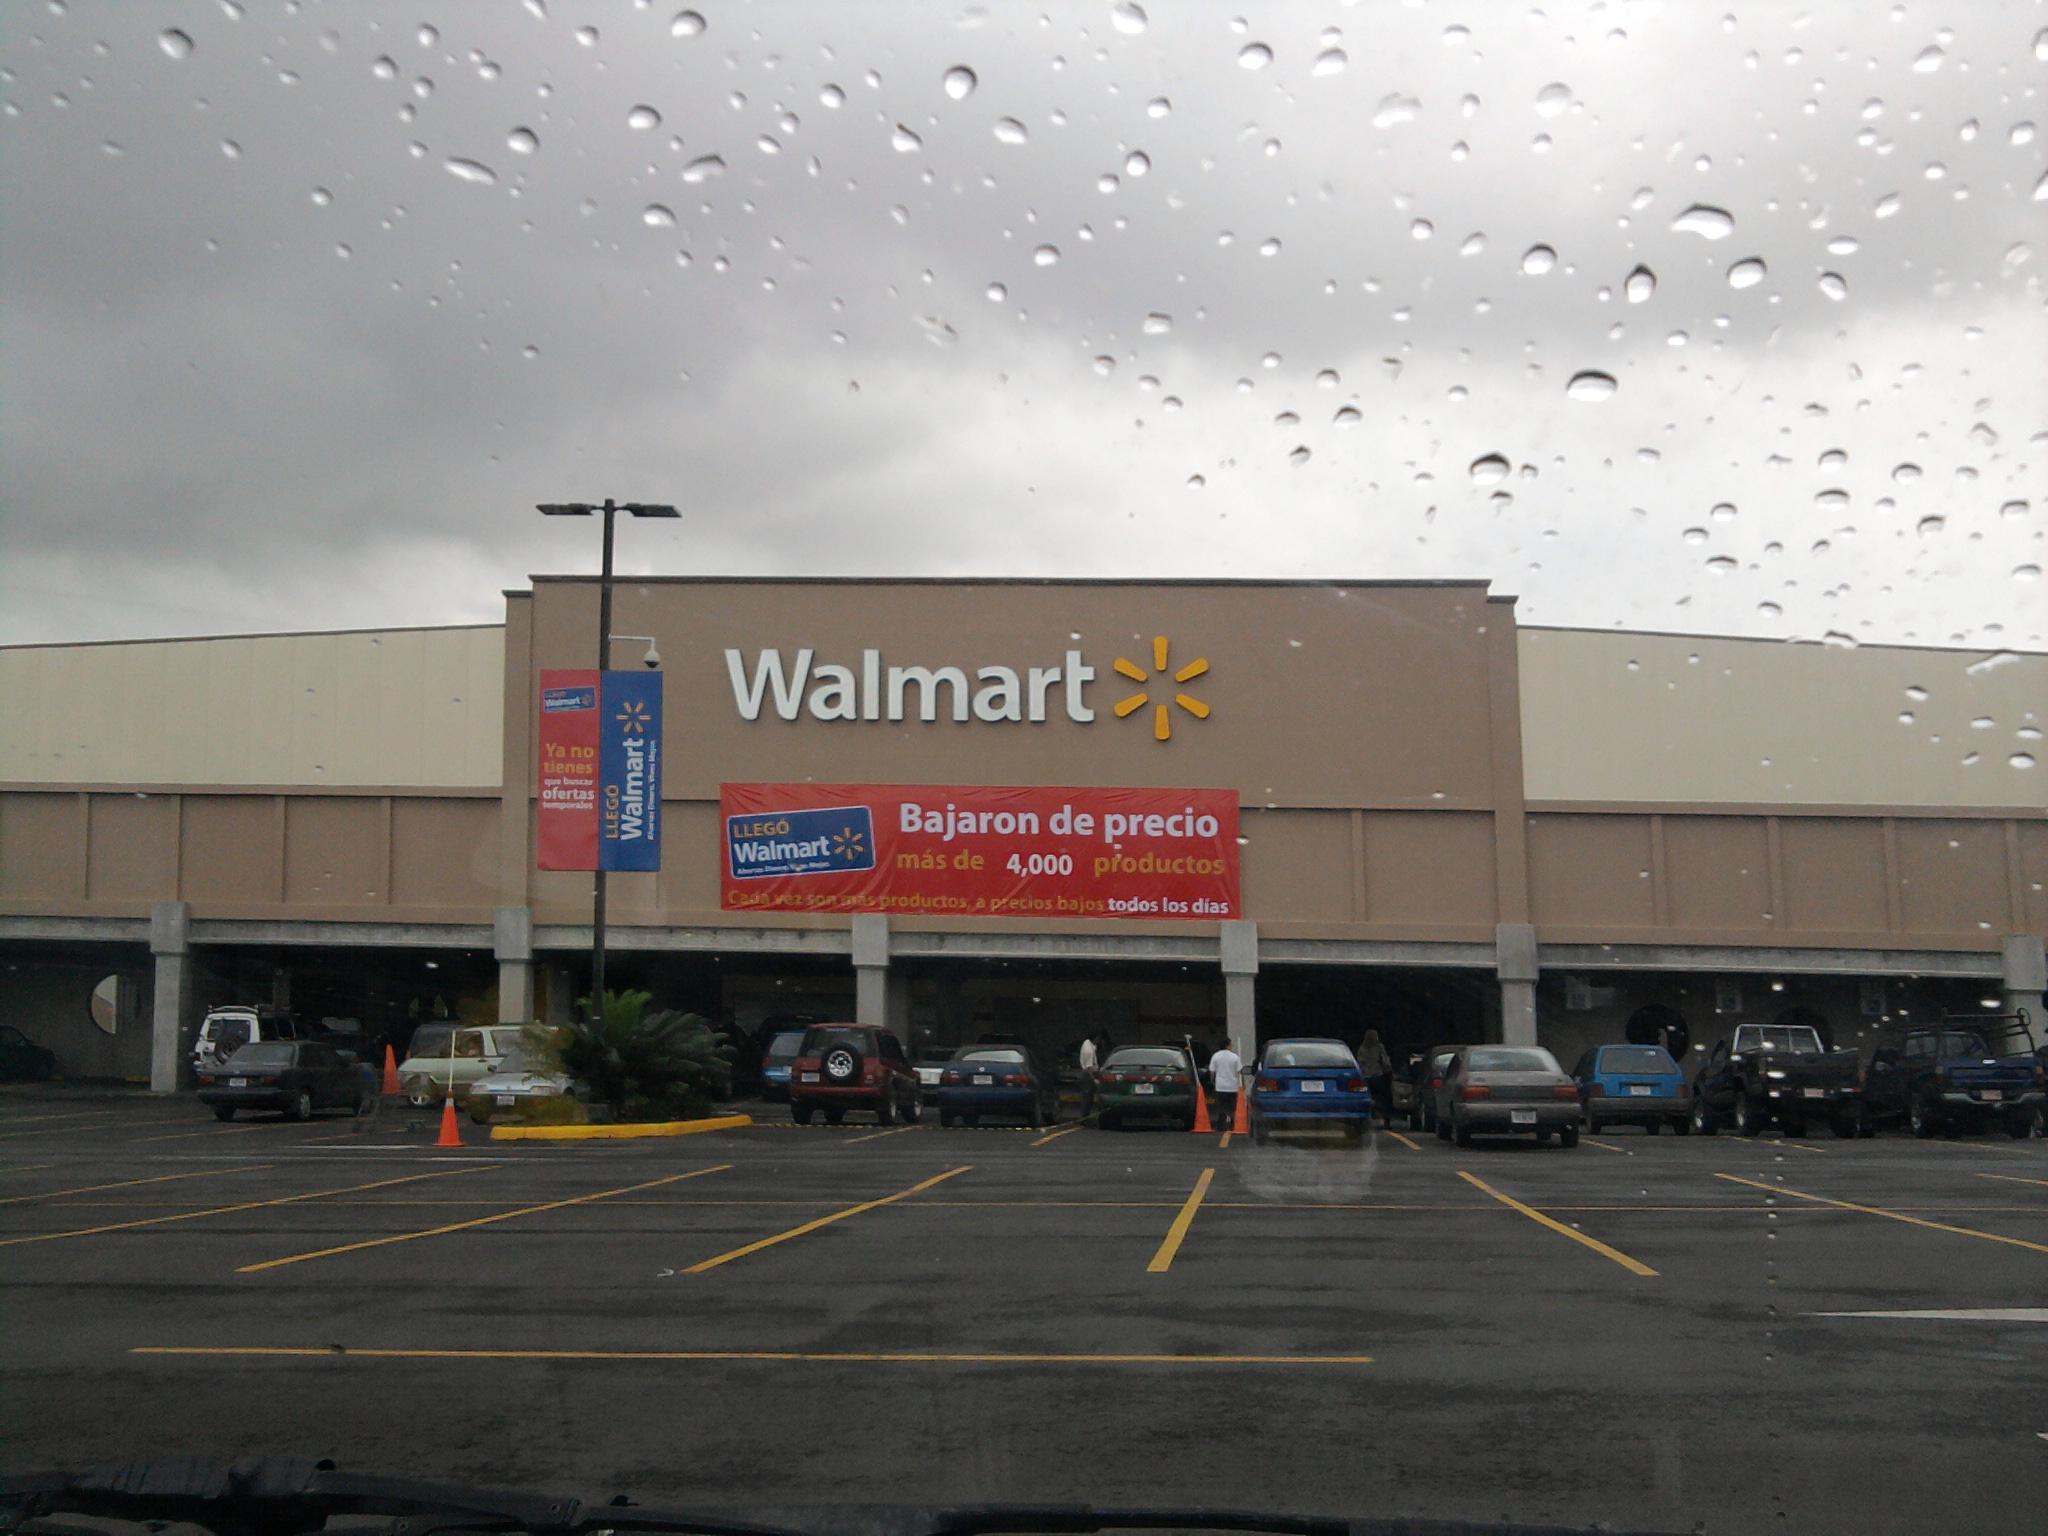 Walmart Muebles Dormitorio – Phurm.com